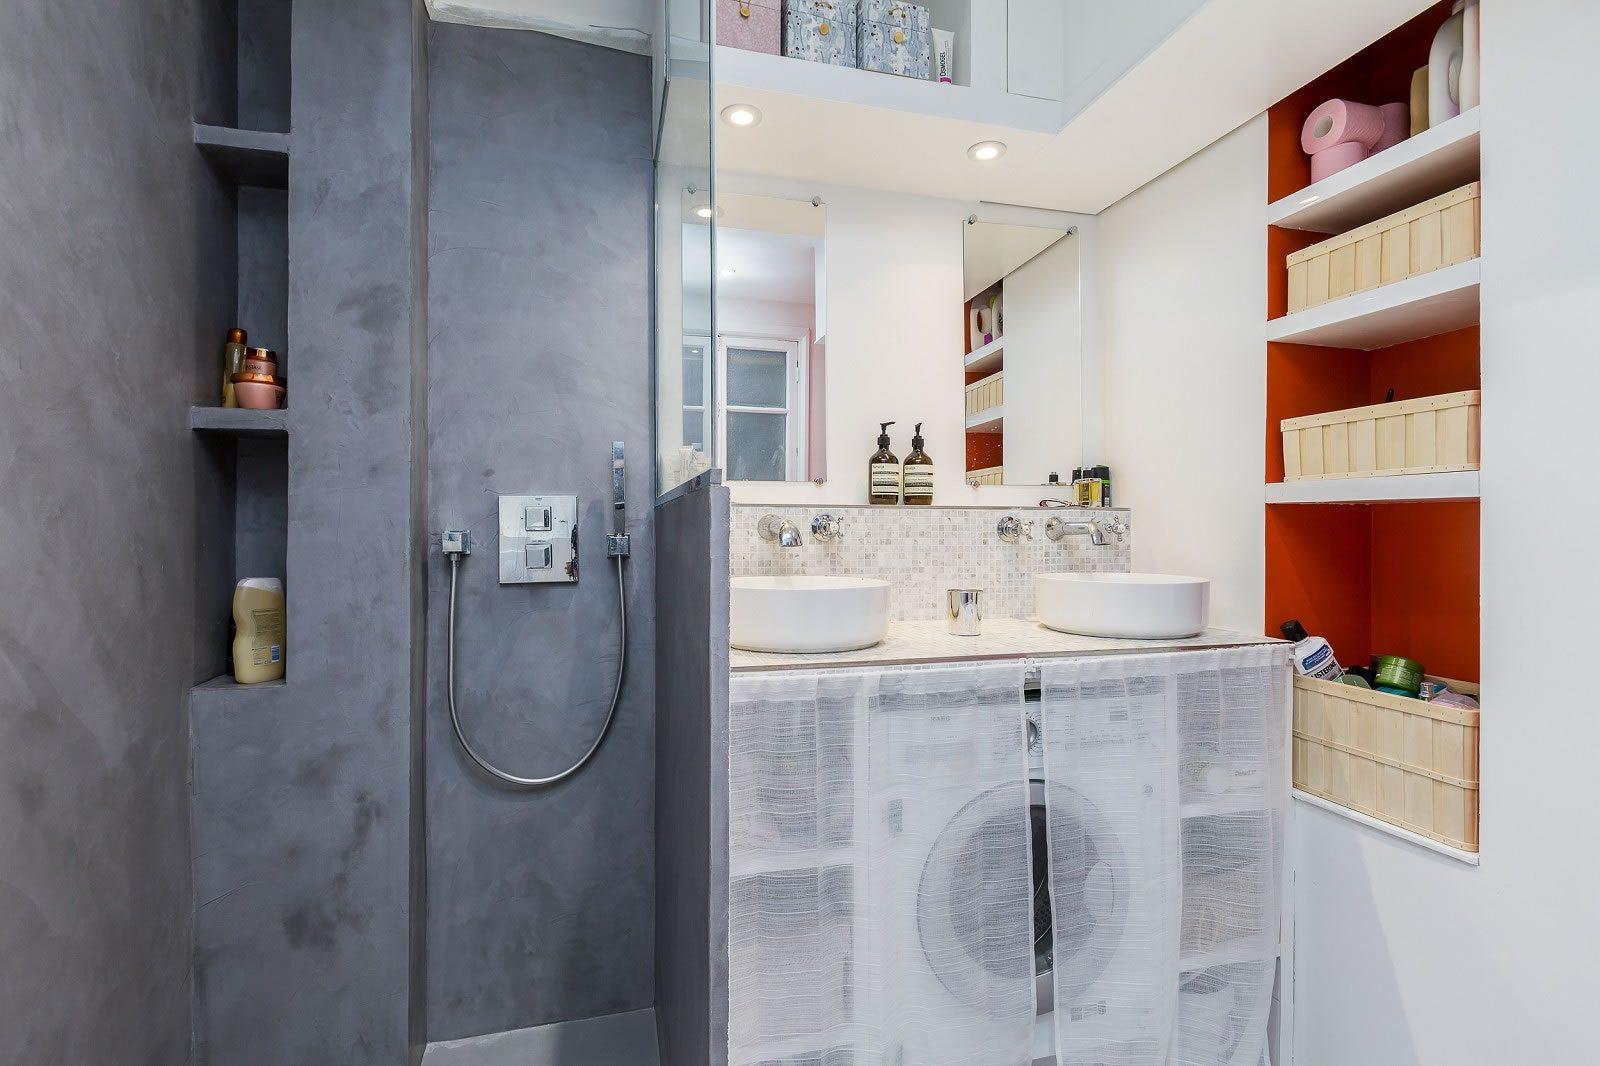 appartement-renove-a-vendre-cours-lumineuse-copropriete-bon-standing